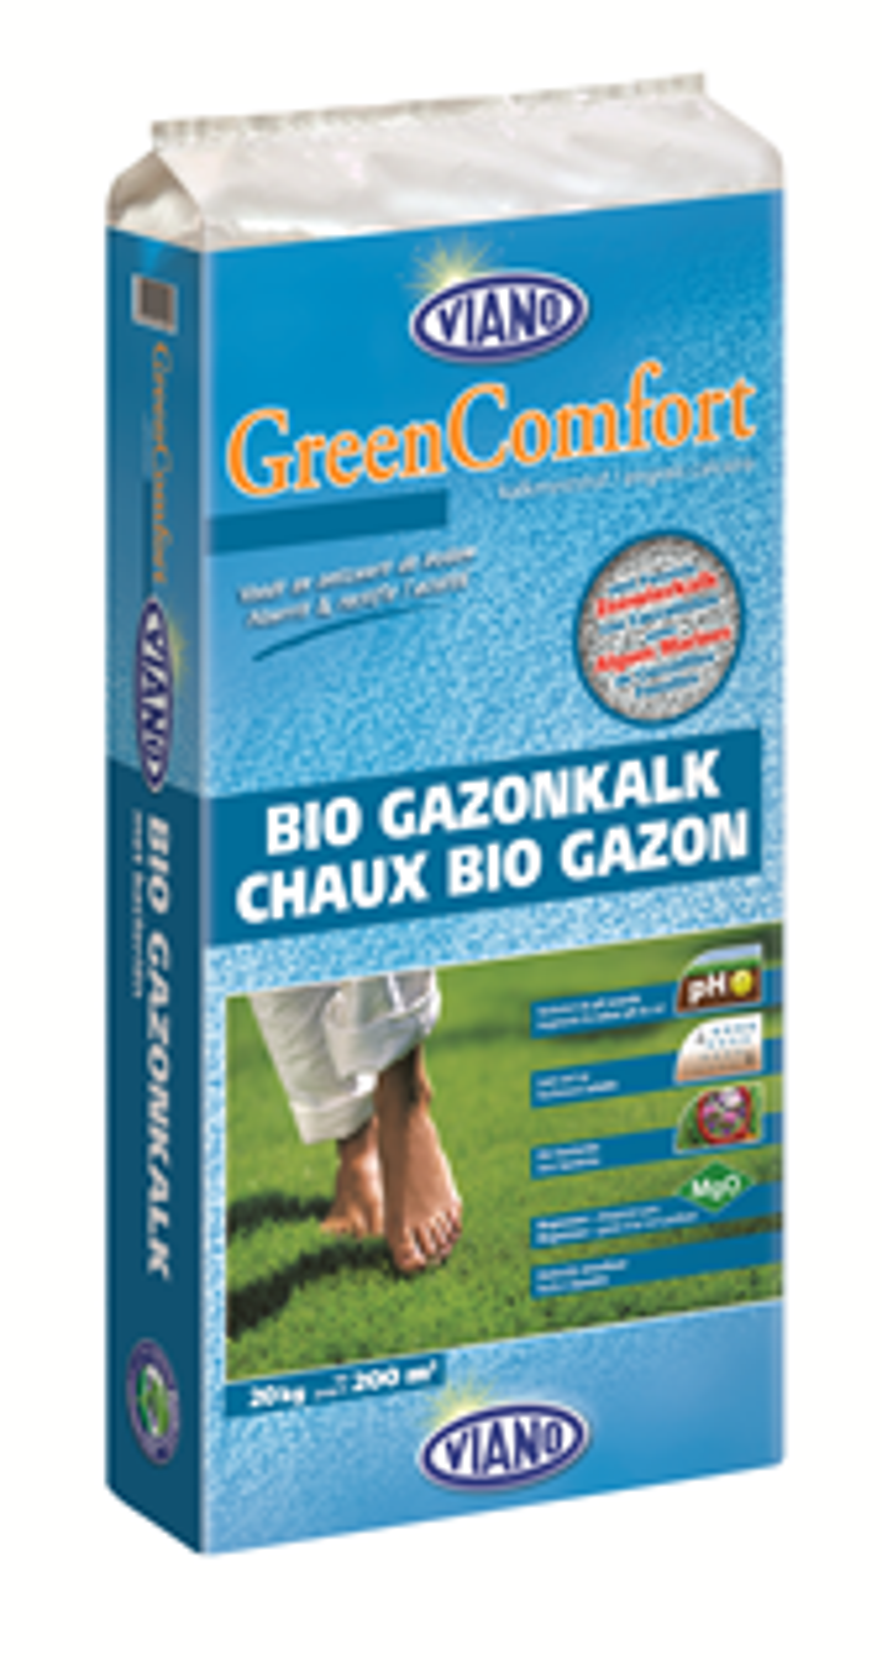 Bio-gazonkalk-zak-20-kg-3MgO